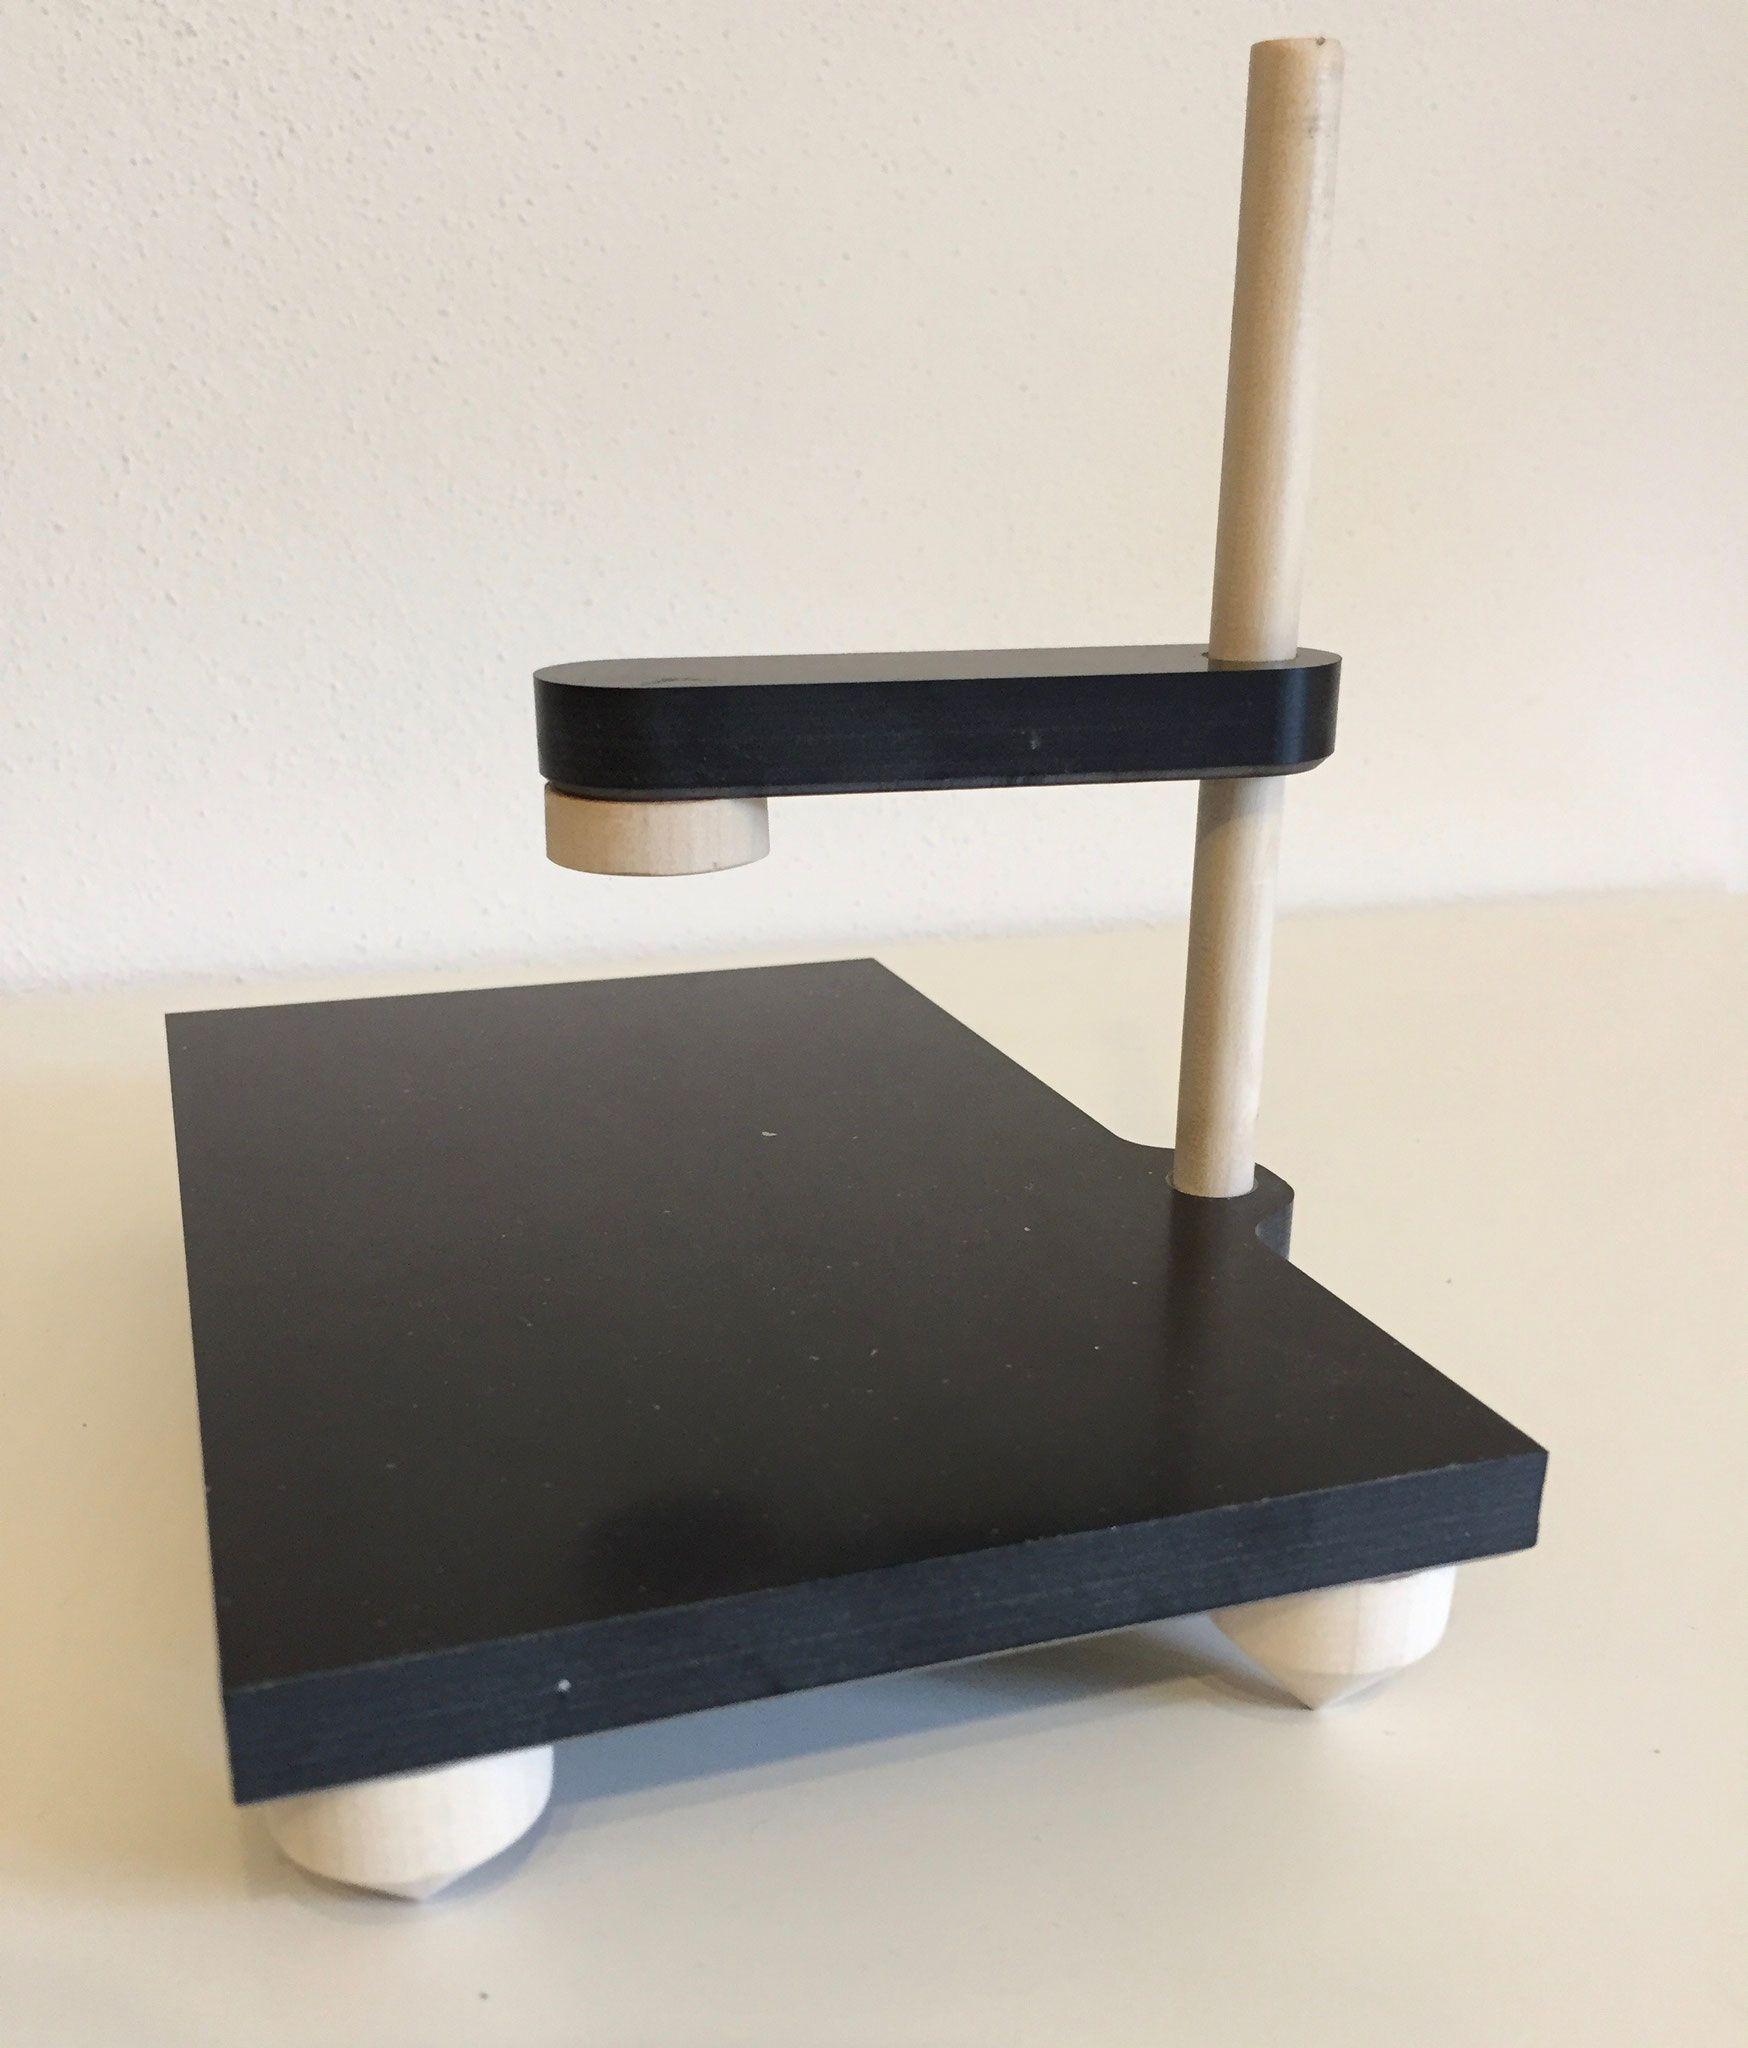 Minibase Hifibase Gerätebase | Raumprodukte | Pinterest